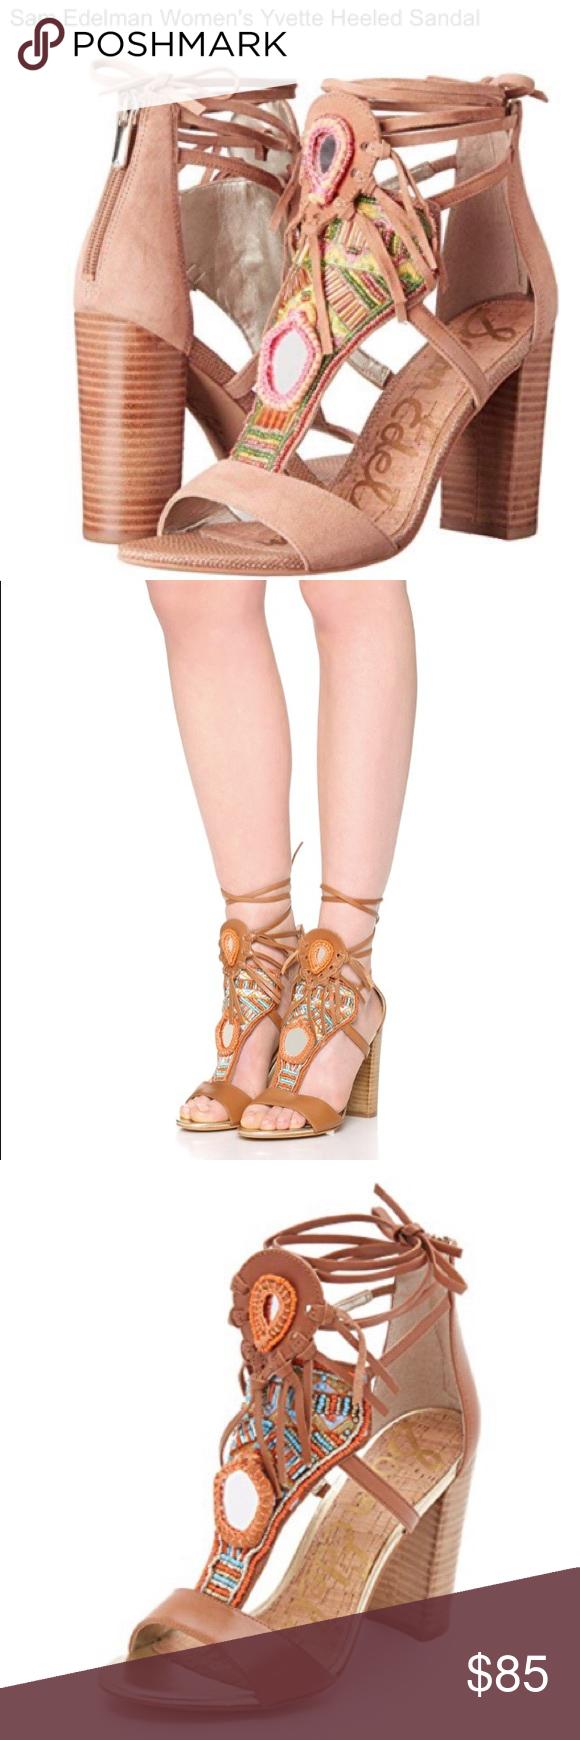 764264b9f Sam Edelman Women s Yvette Heeled Sandal Sz 9 Like new! Excellent condition Sam  Edelman Women s